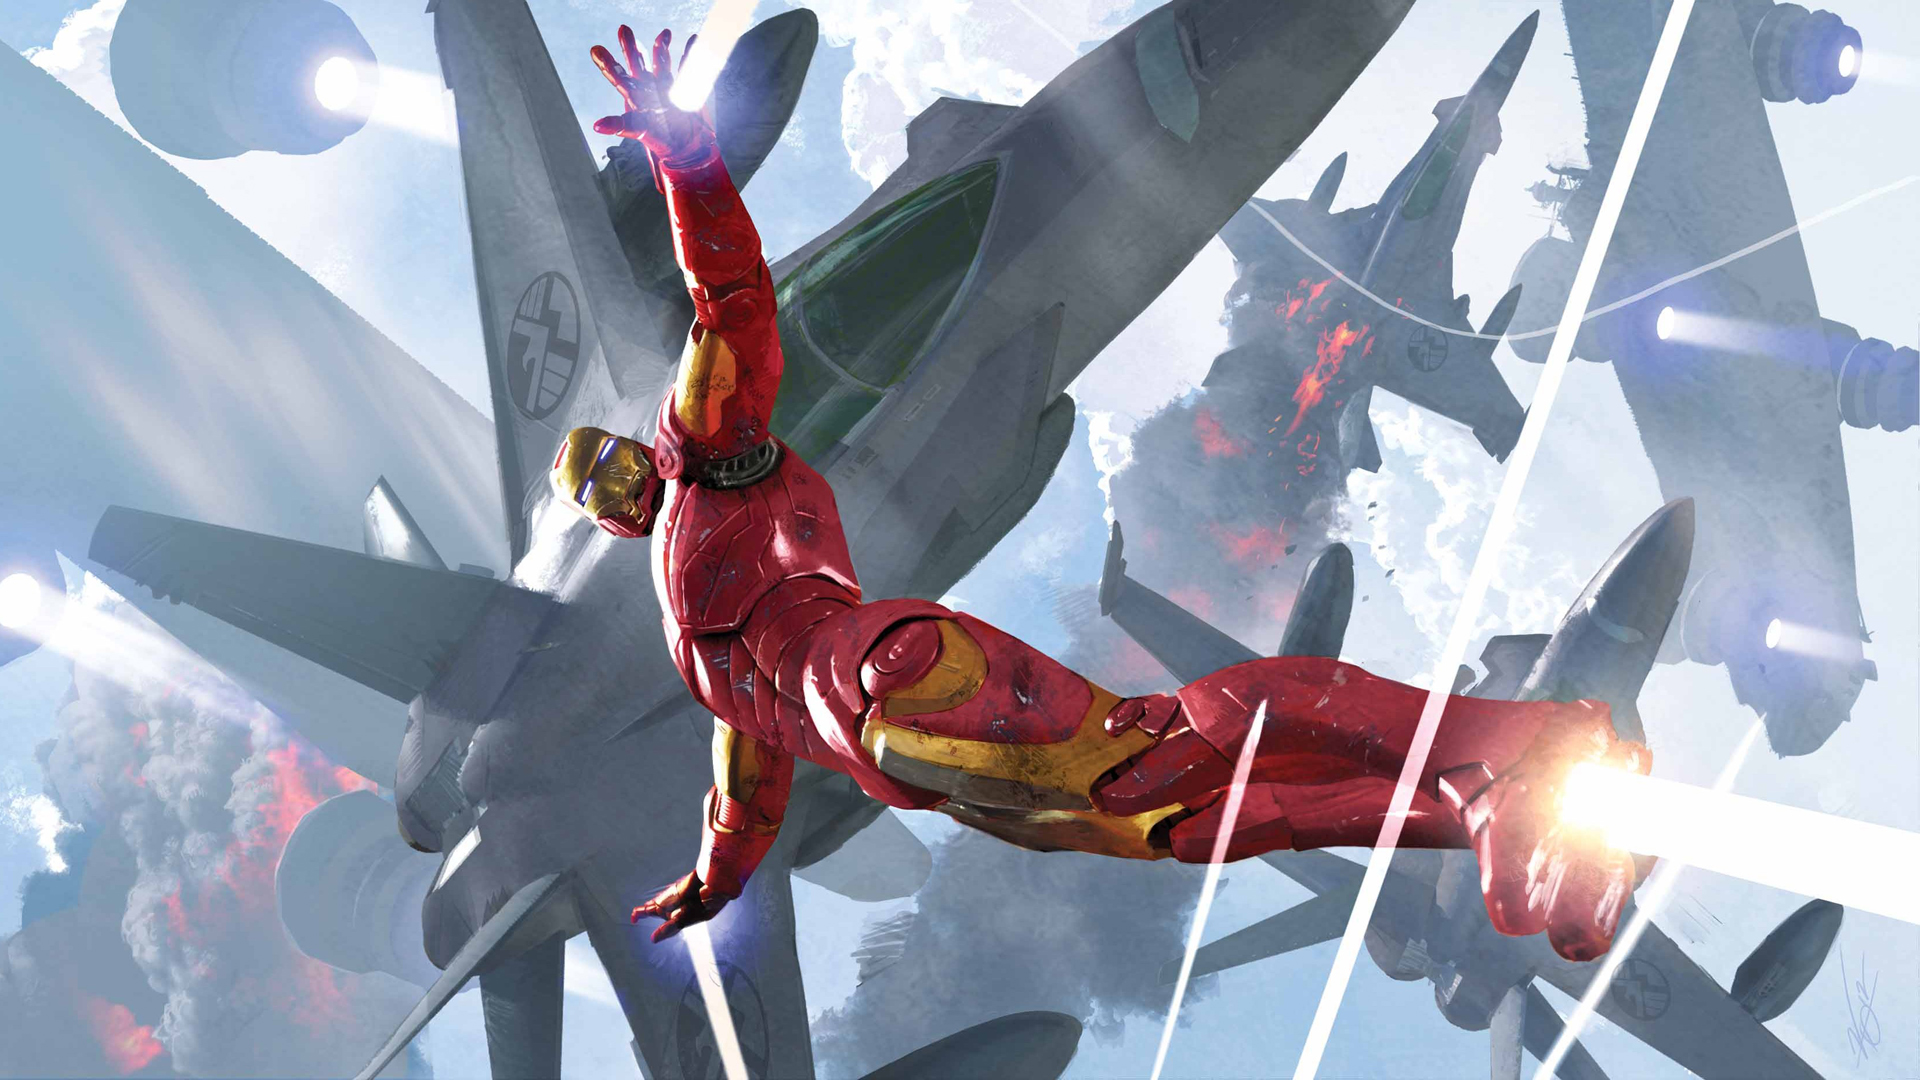 Iron Man vs fighter jets.jpg